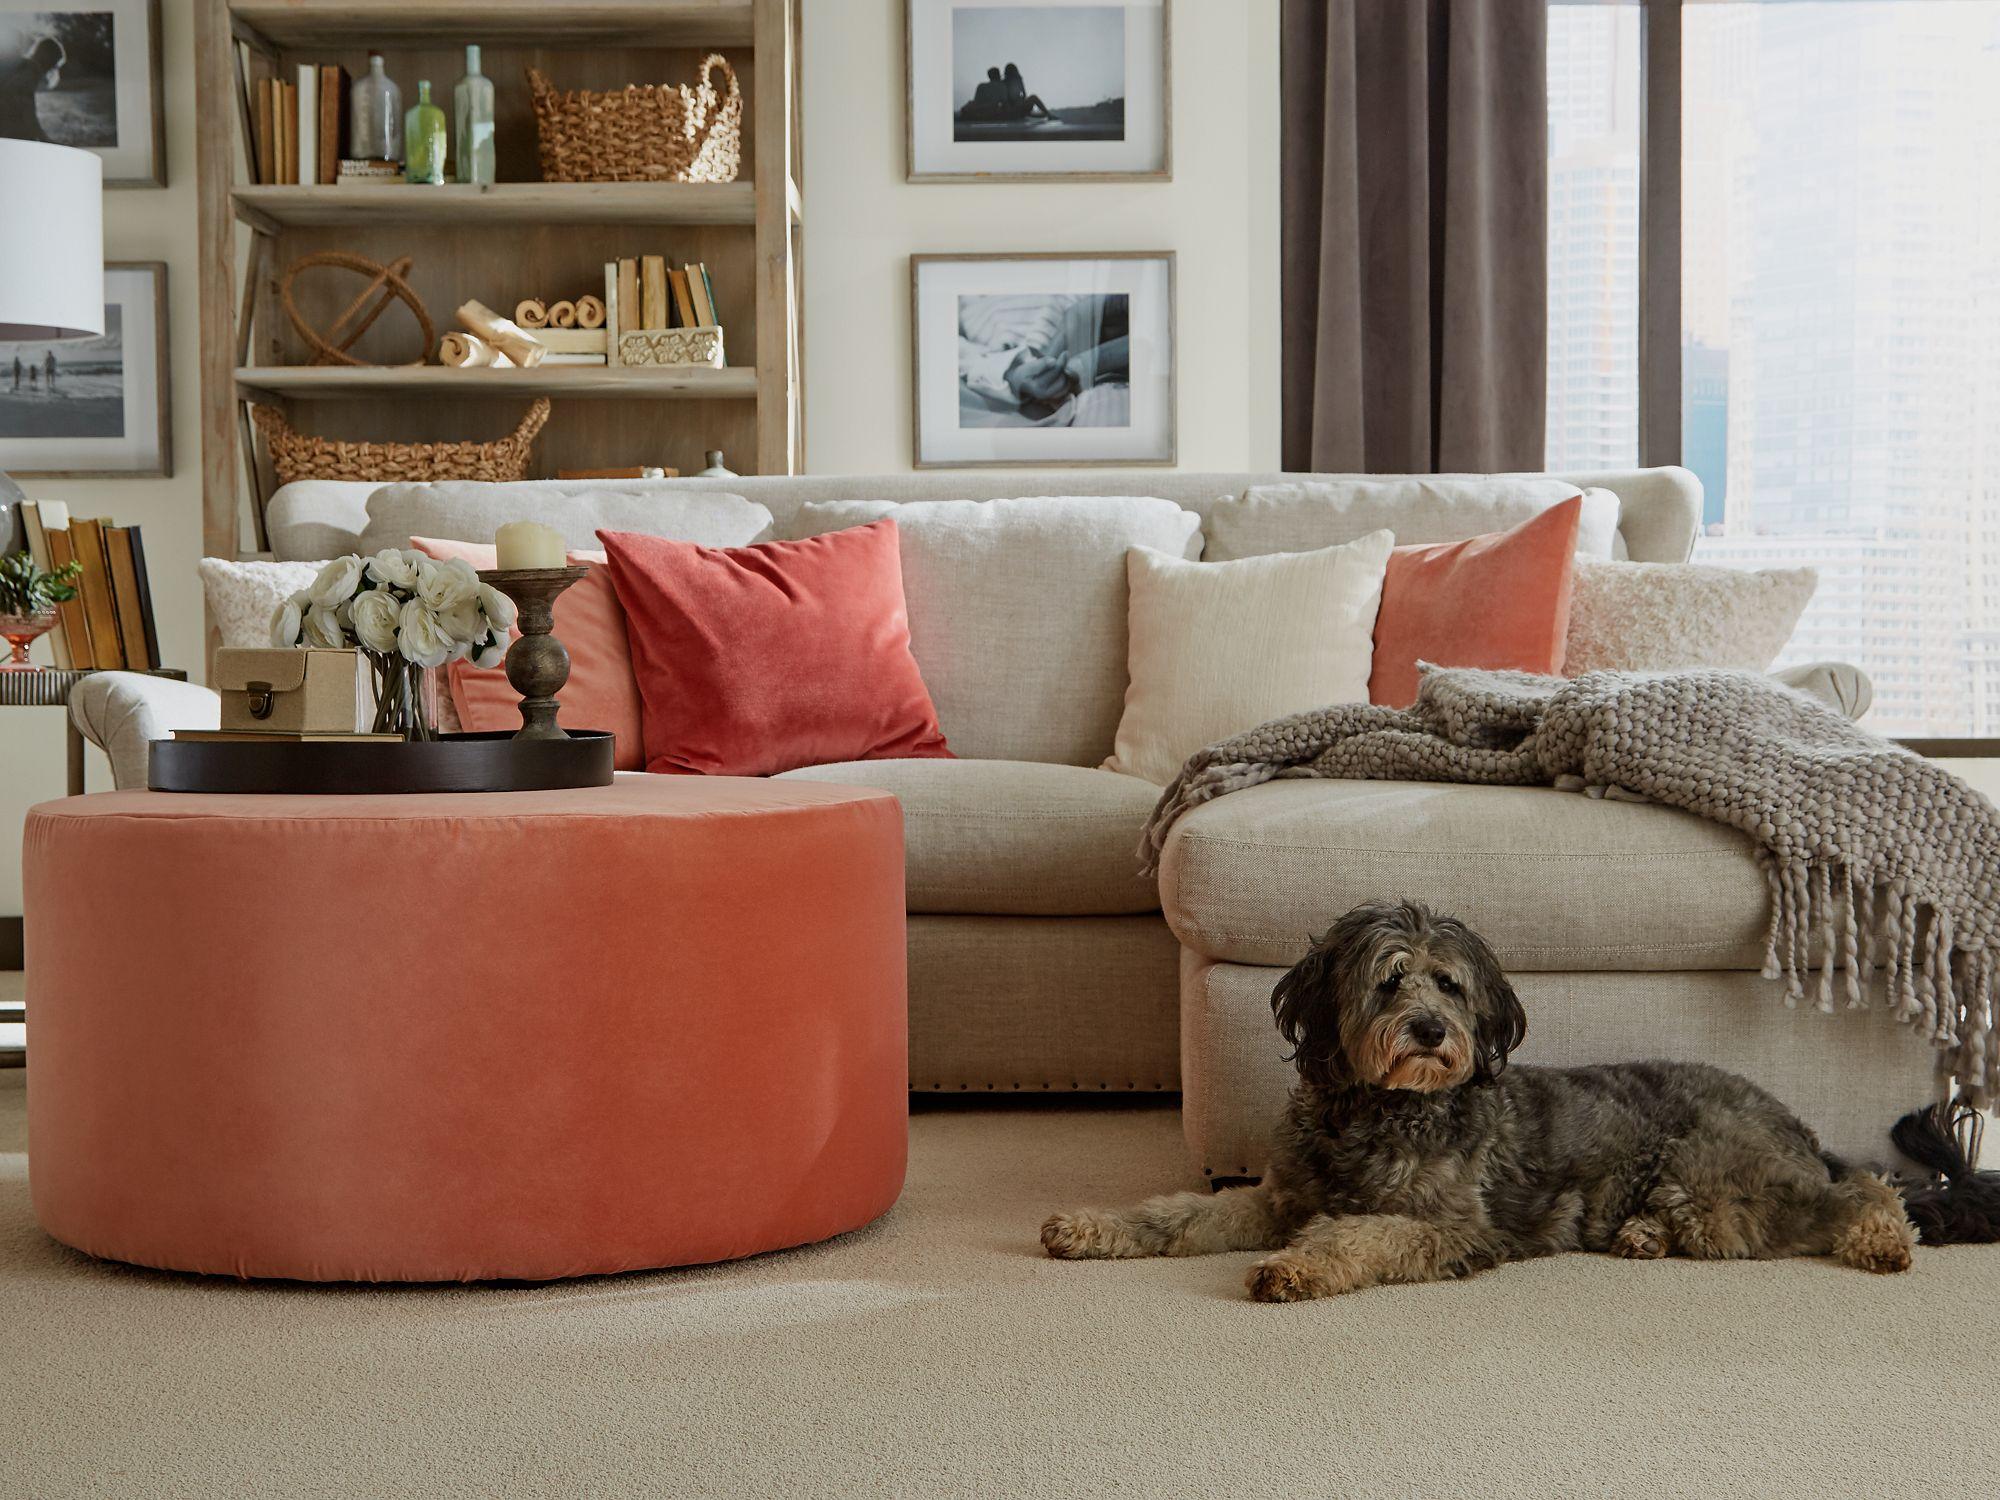 SmartStrand Forever Clean. Superior stain resistant carpet from Mohawk Flooring.